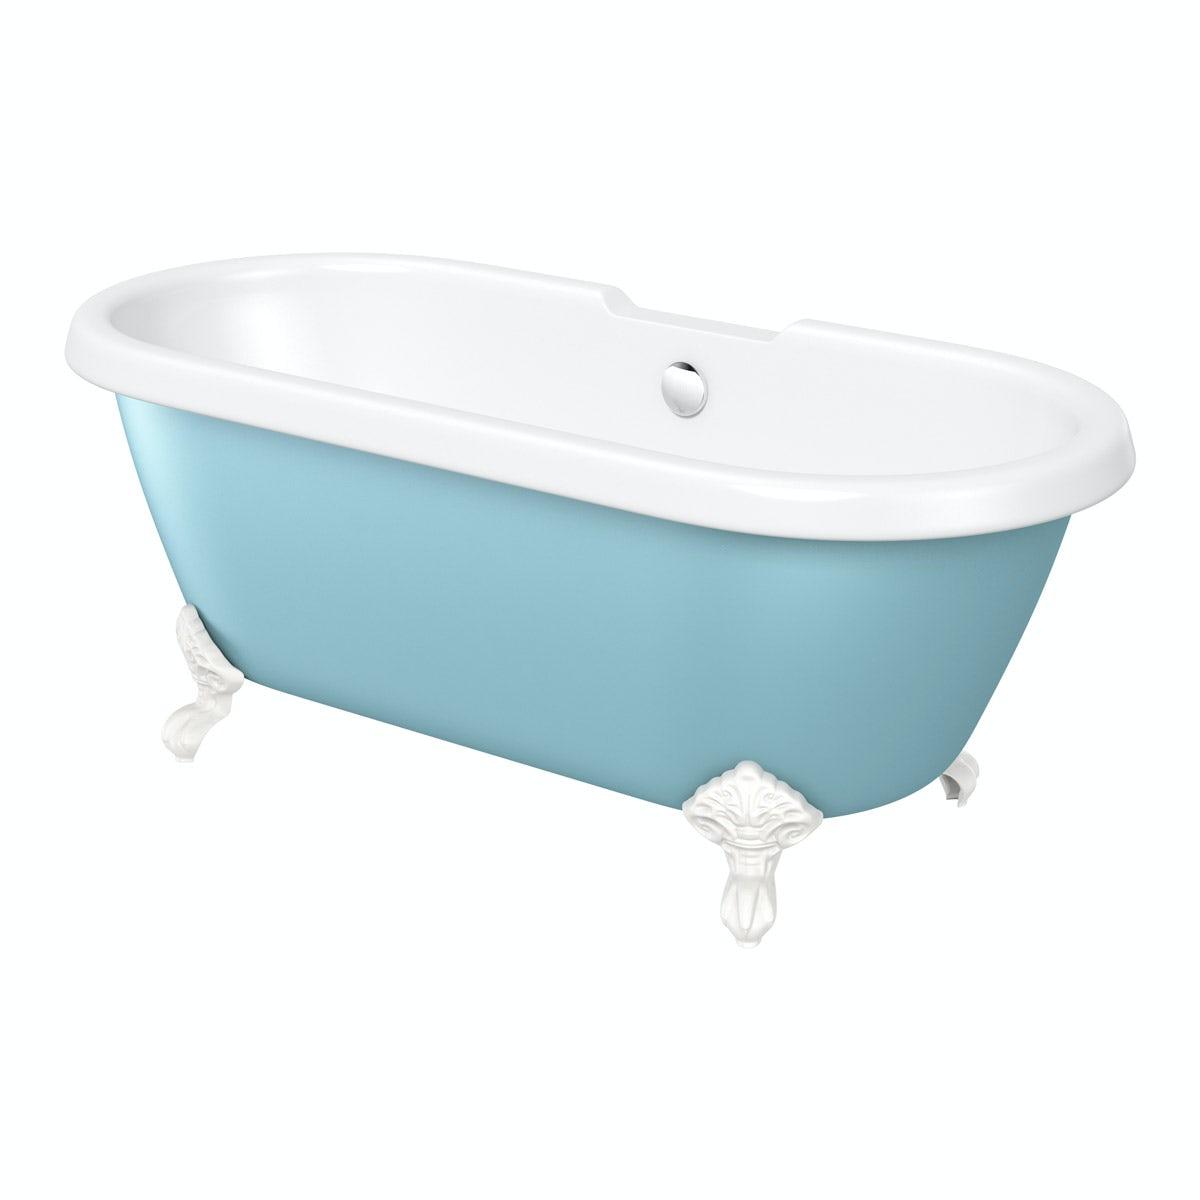 The Bath Co. Dulwich Bluebell coloured bath